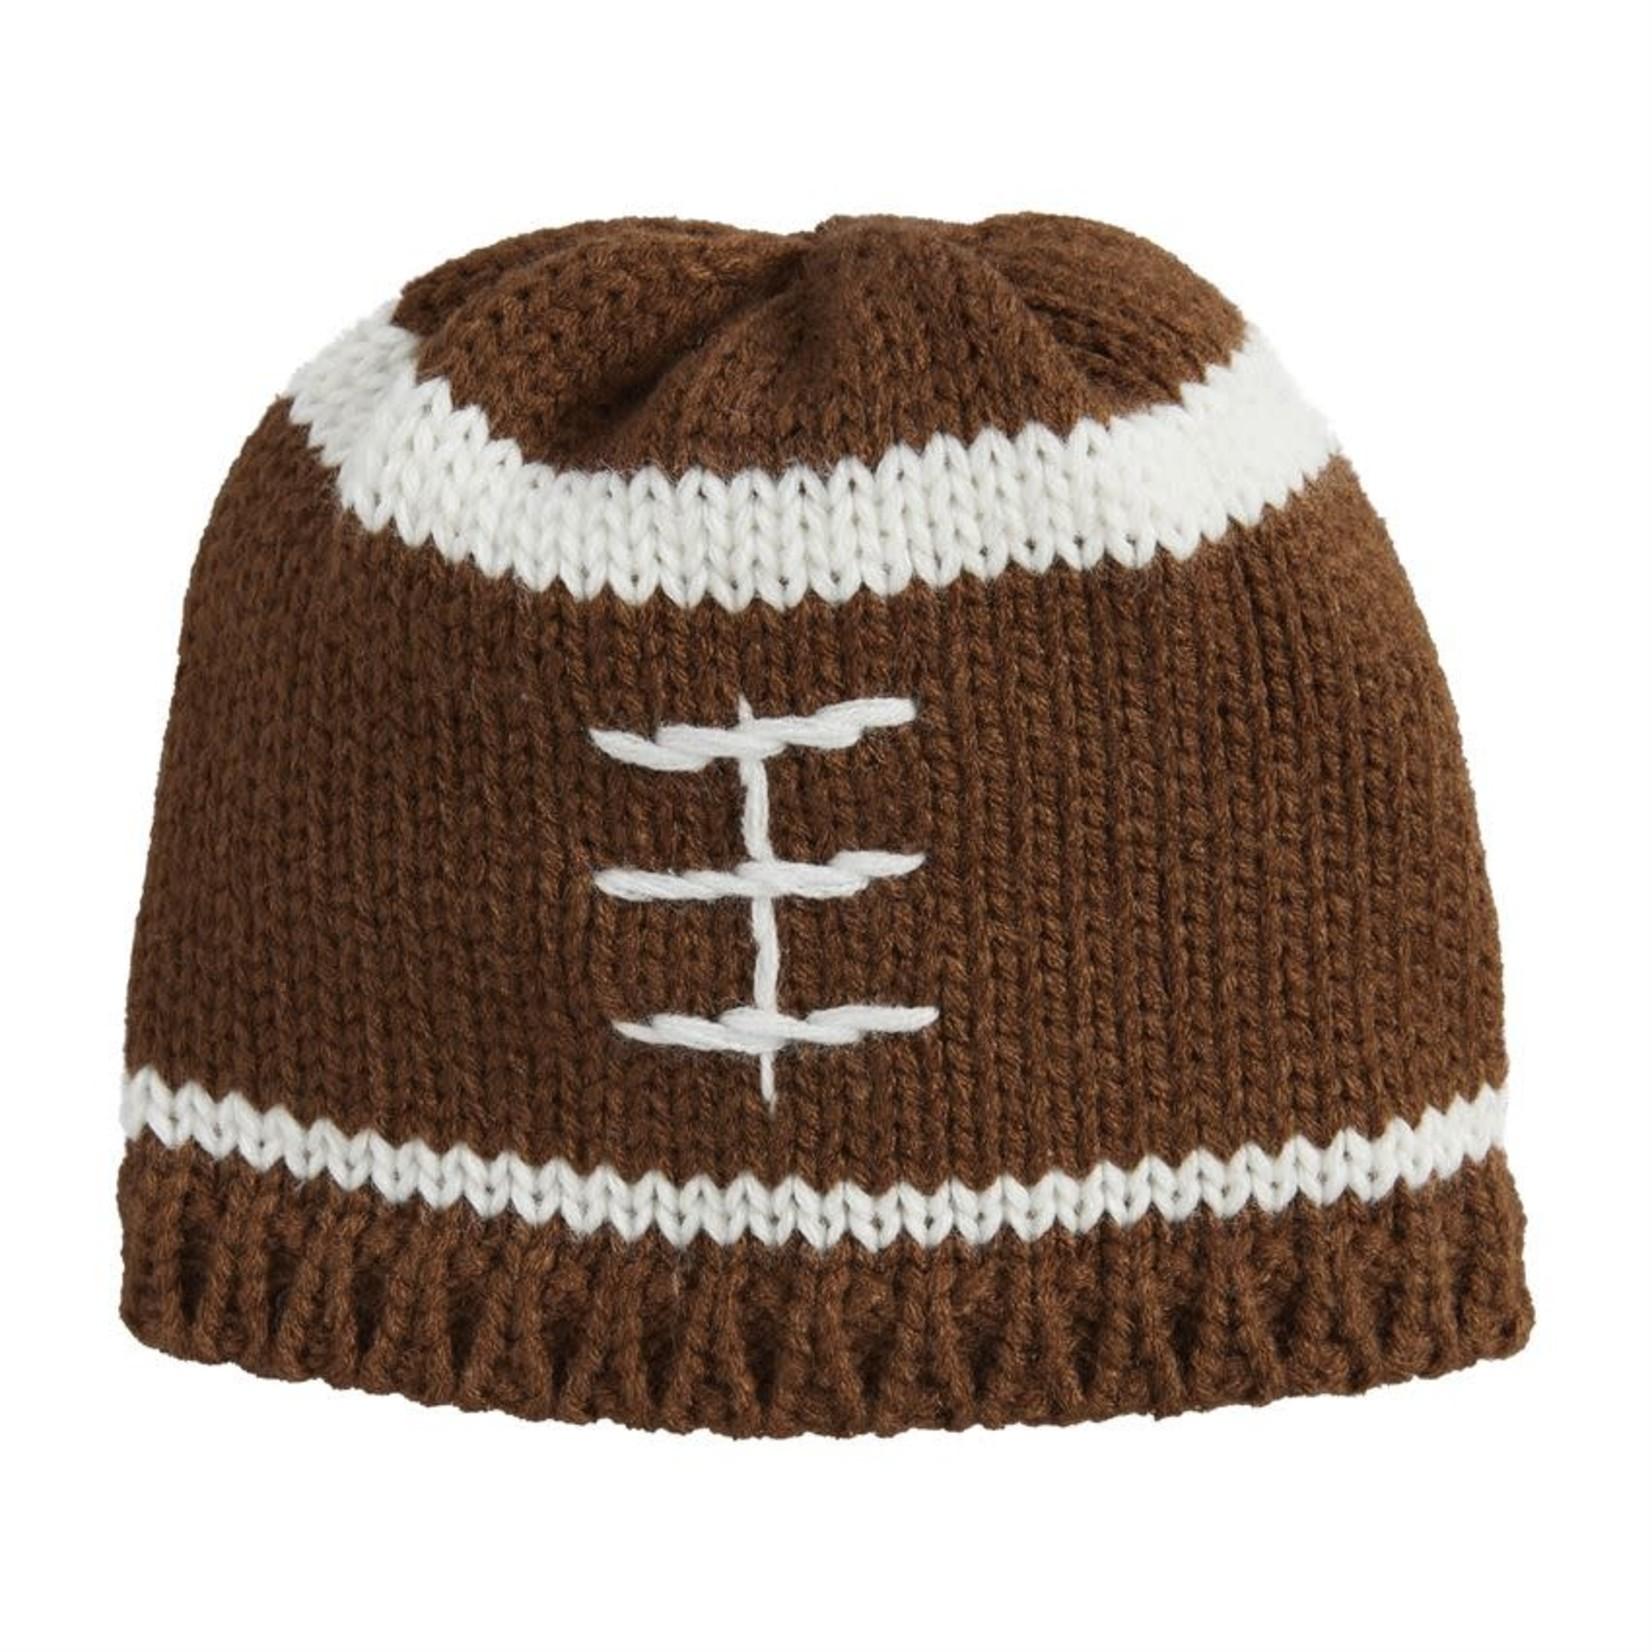 Football Knit Hat - LRG